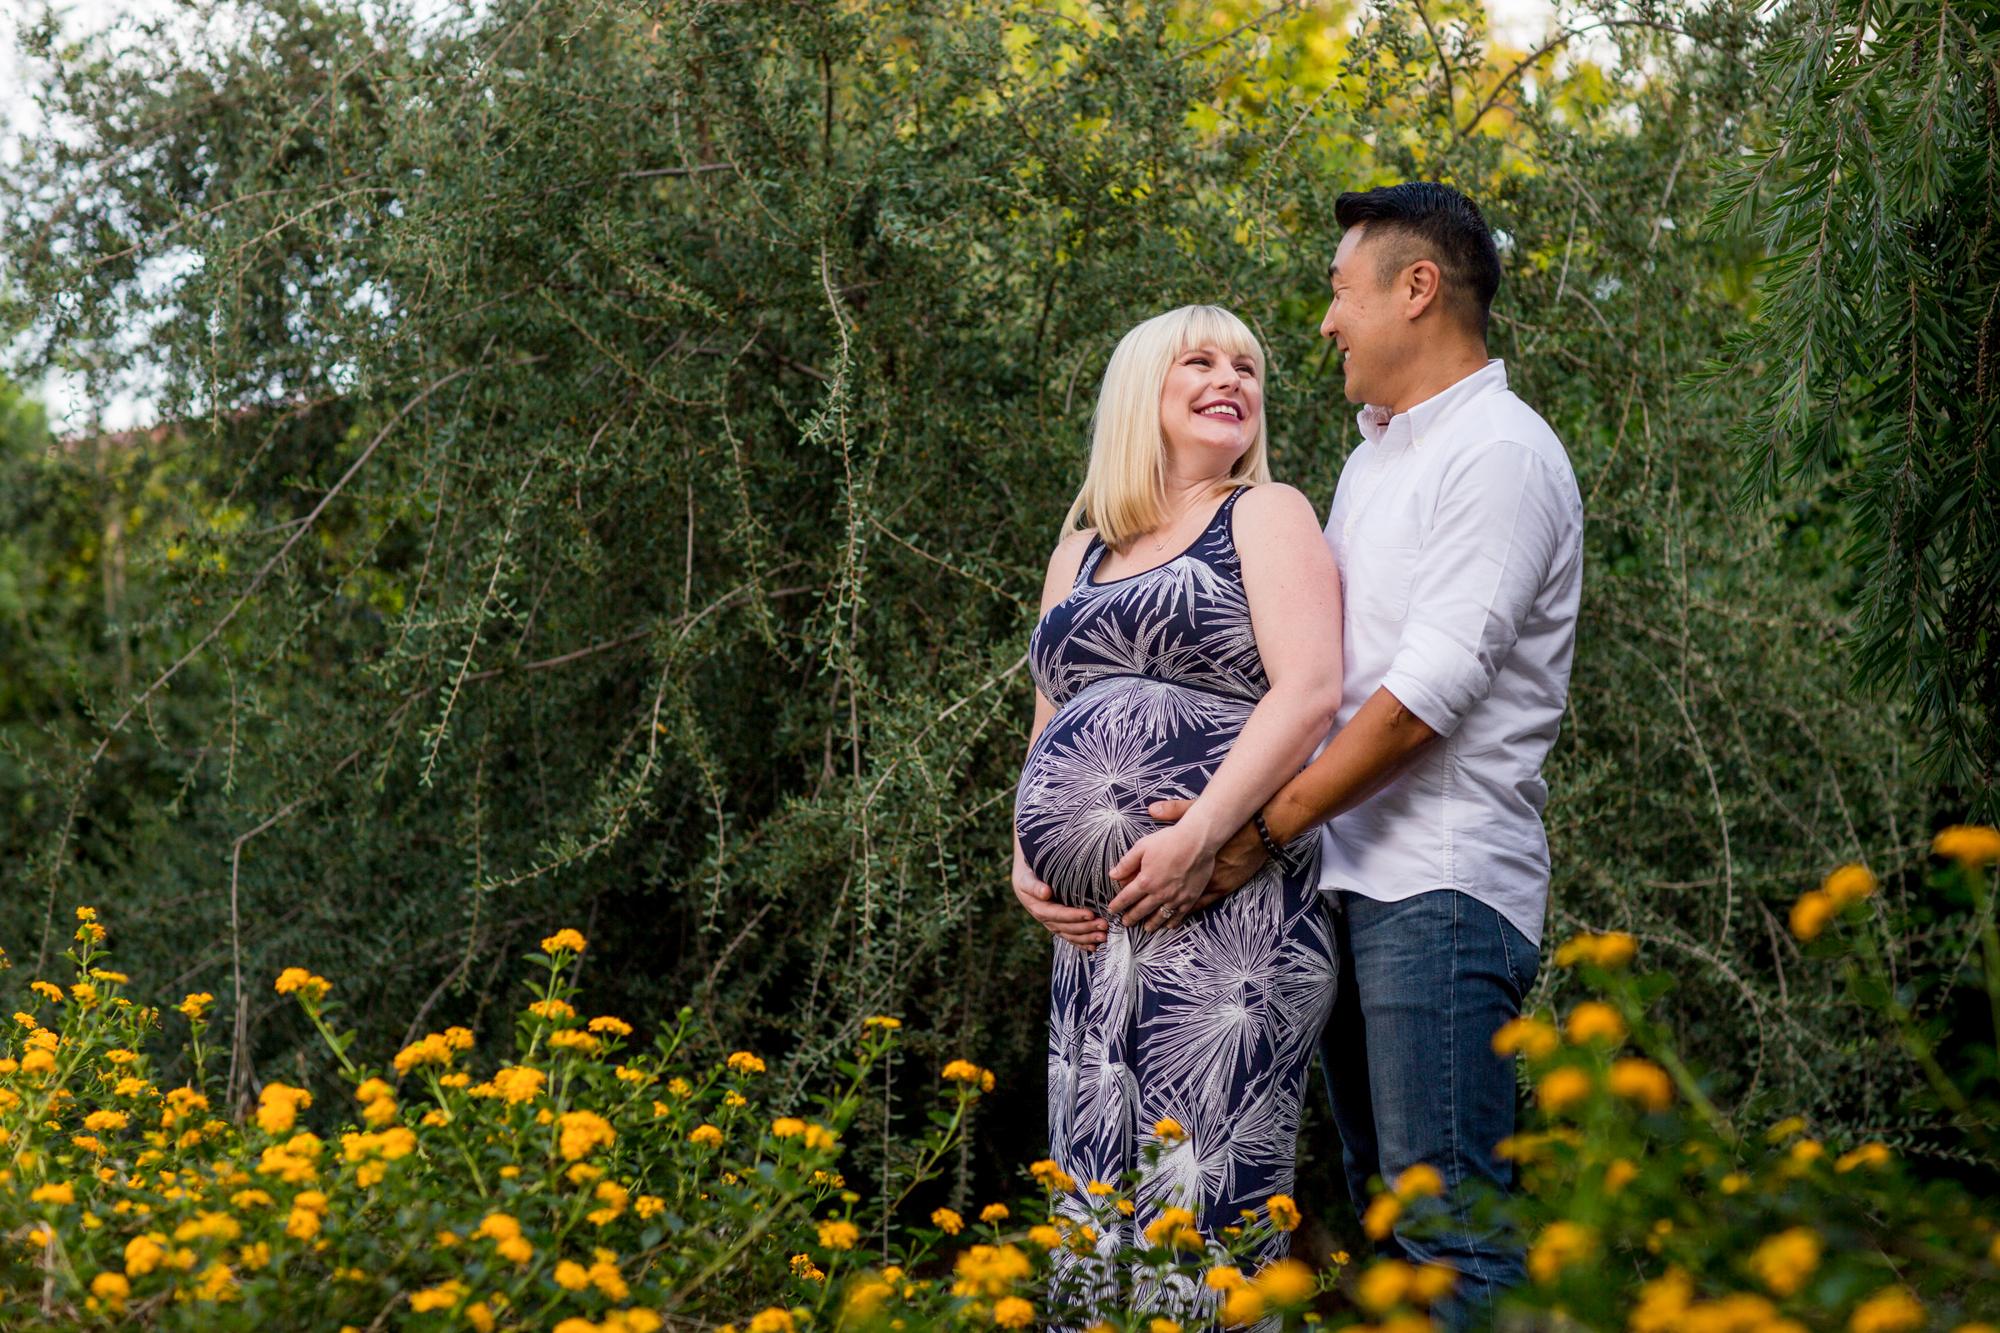 012-2018-Lacy-Park-Maternity.jpg